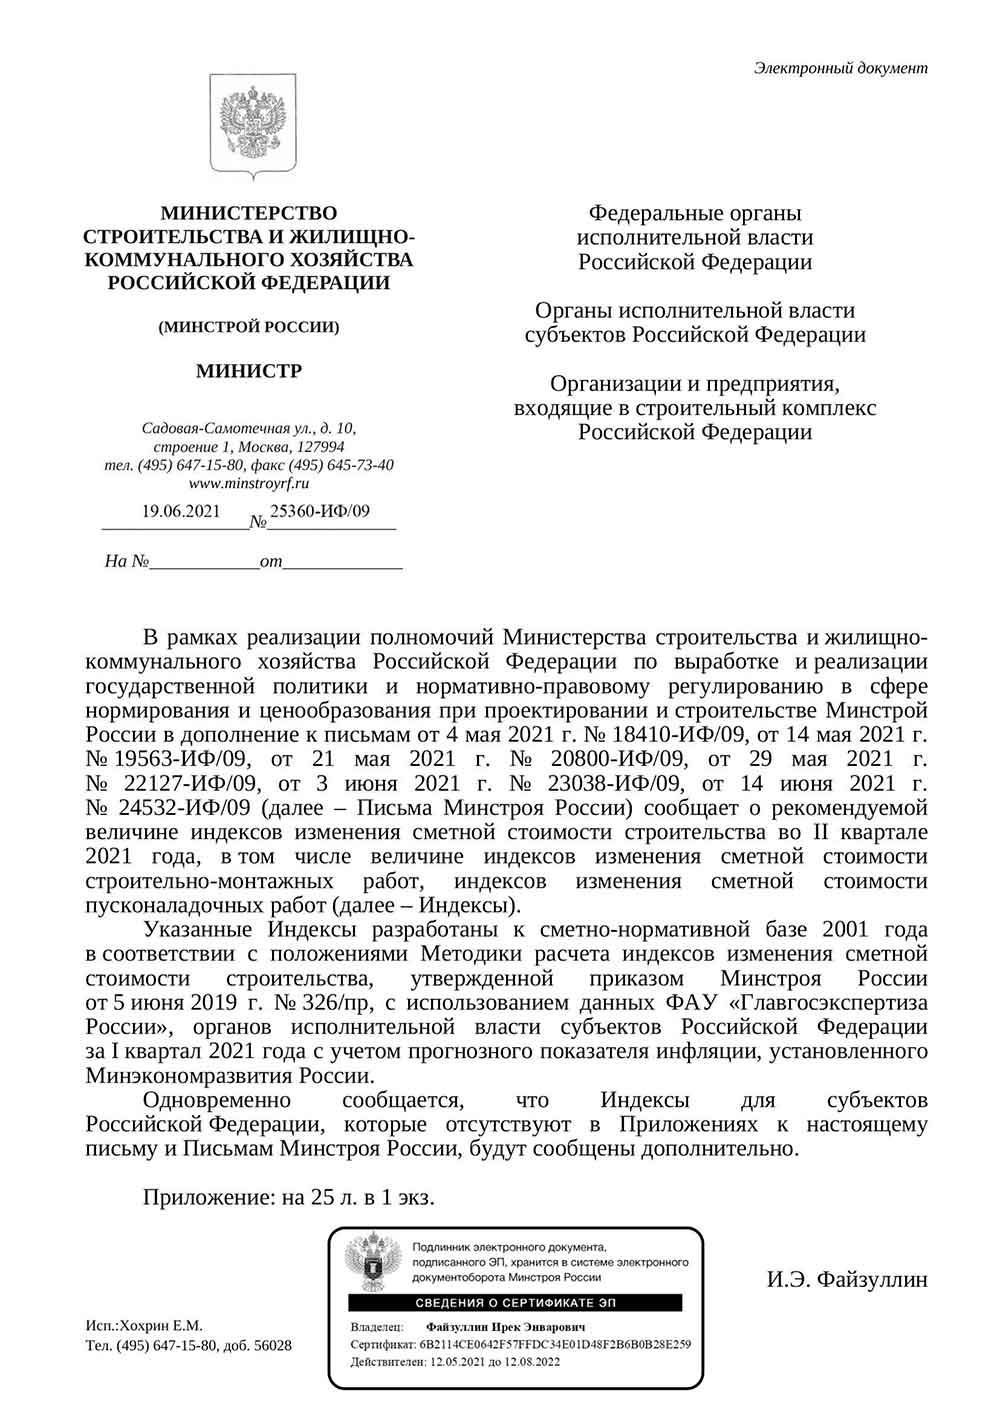 Письмо Минстроя РФ №25360-ИФ/09 от 19.06.2021 г.